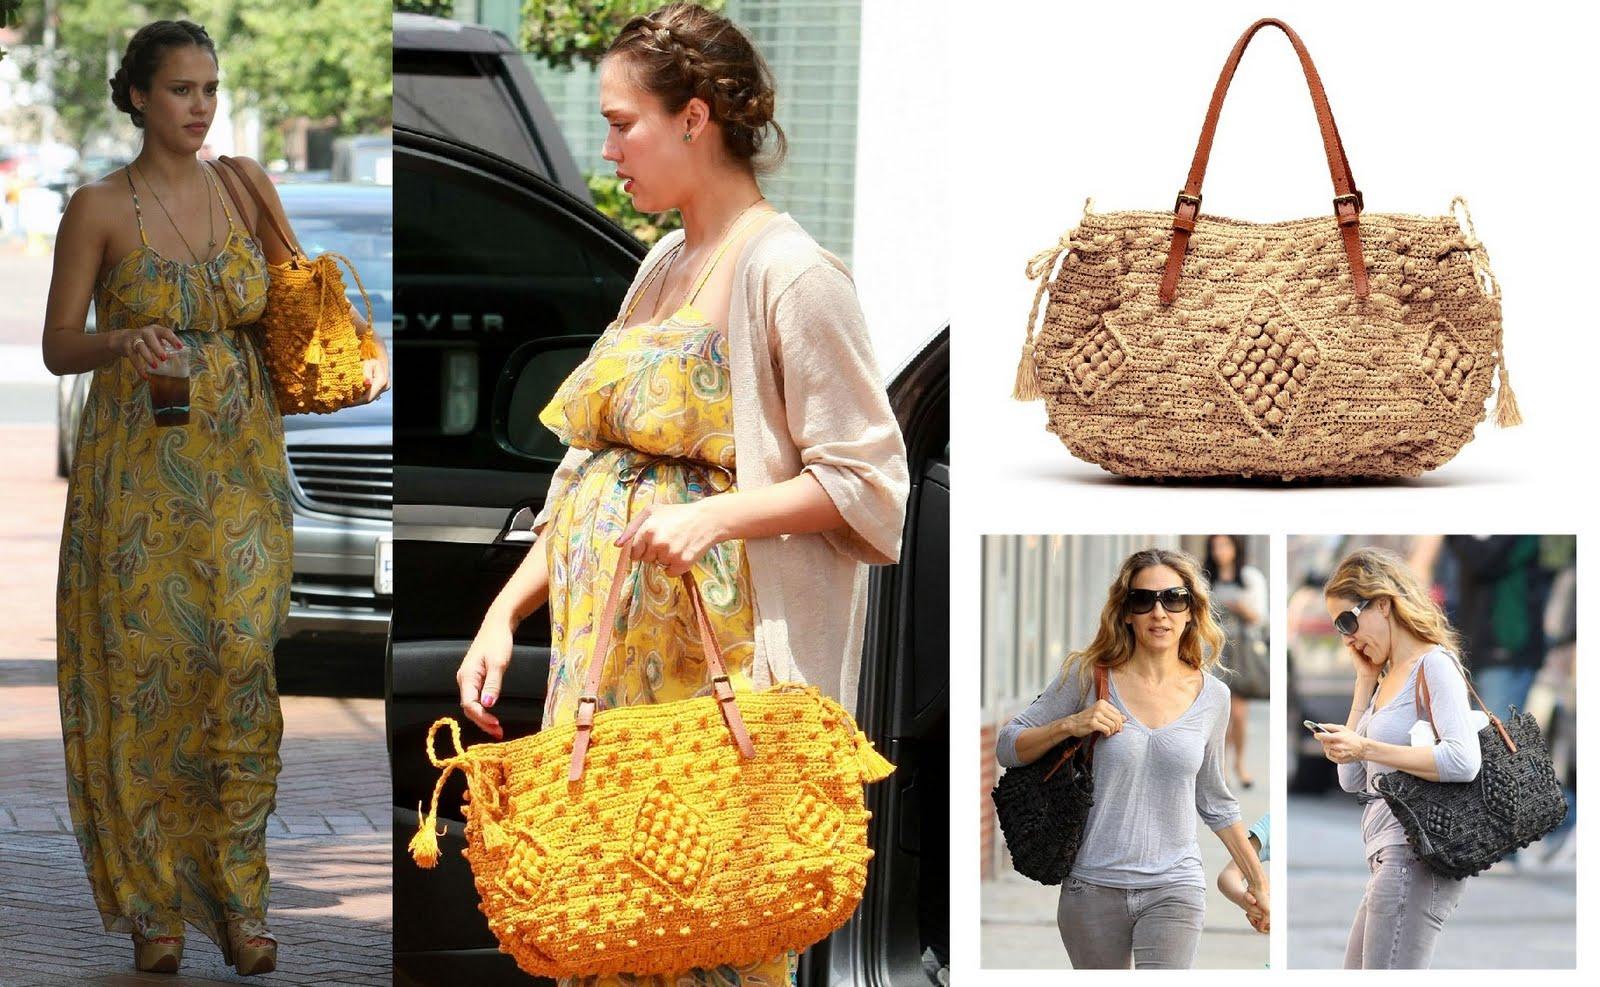 http://3.bp.blogspot.com/-7va-wFPkkCI/ThvOqb5hSvI/AAAAAAAAFxo/VpBbSOJ1udU/s1600/Jessica+Alba%2527s+Yellow+Crochet+Bag.jpg